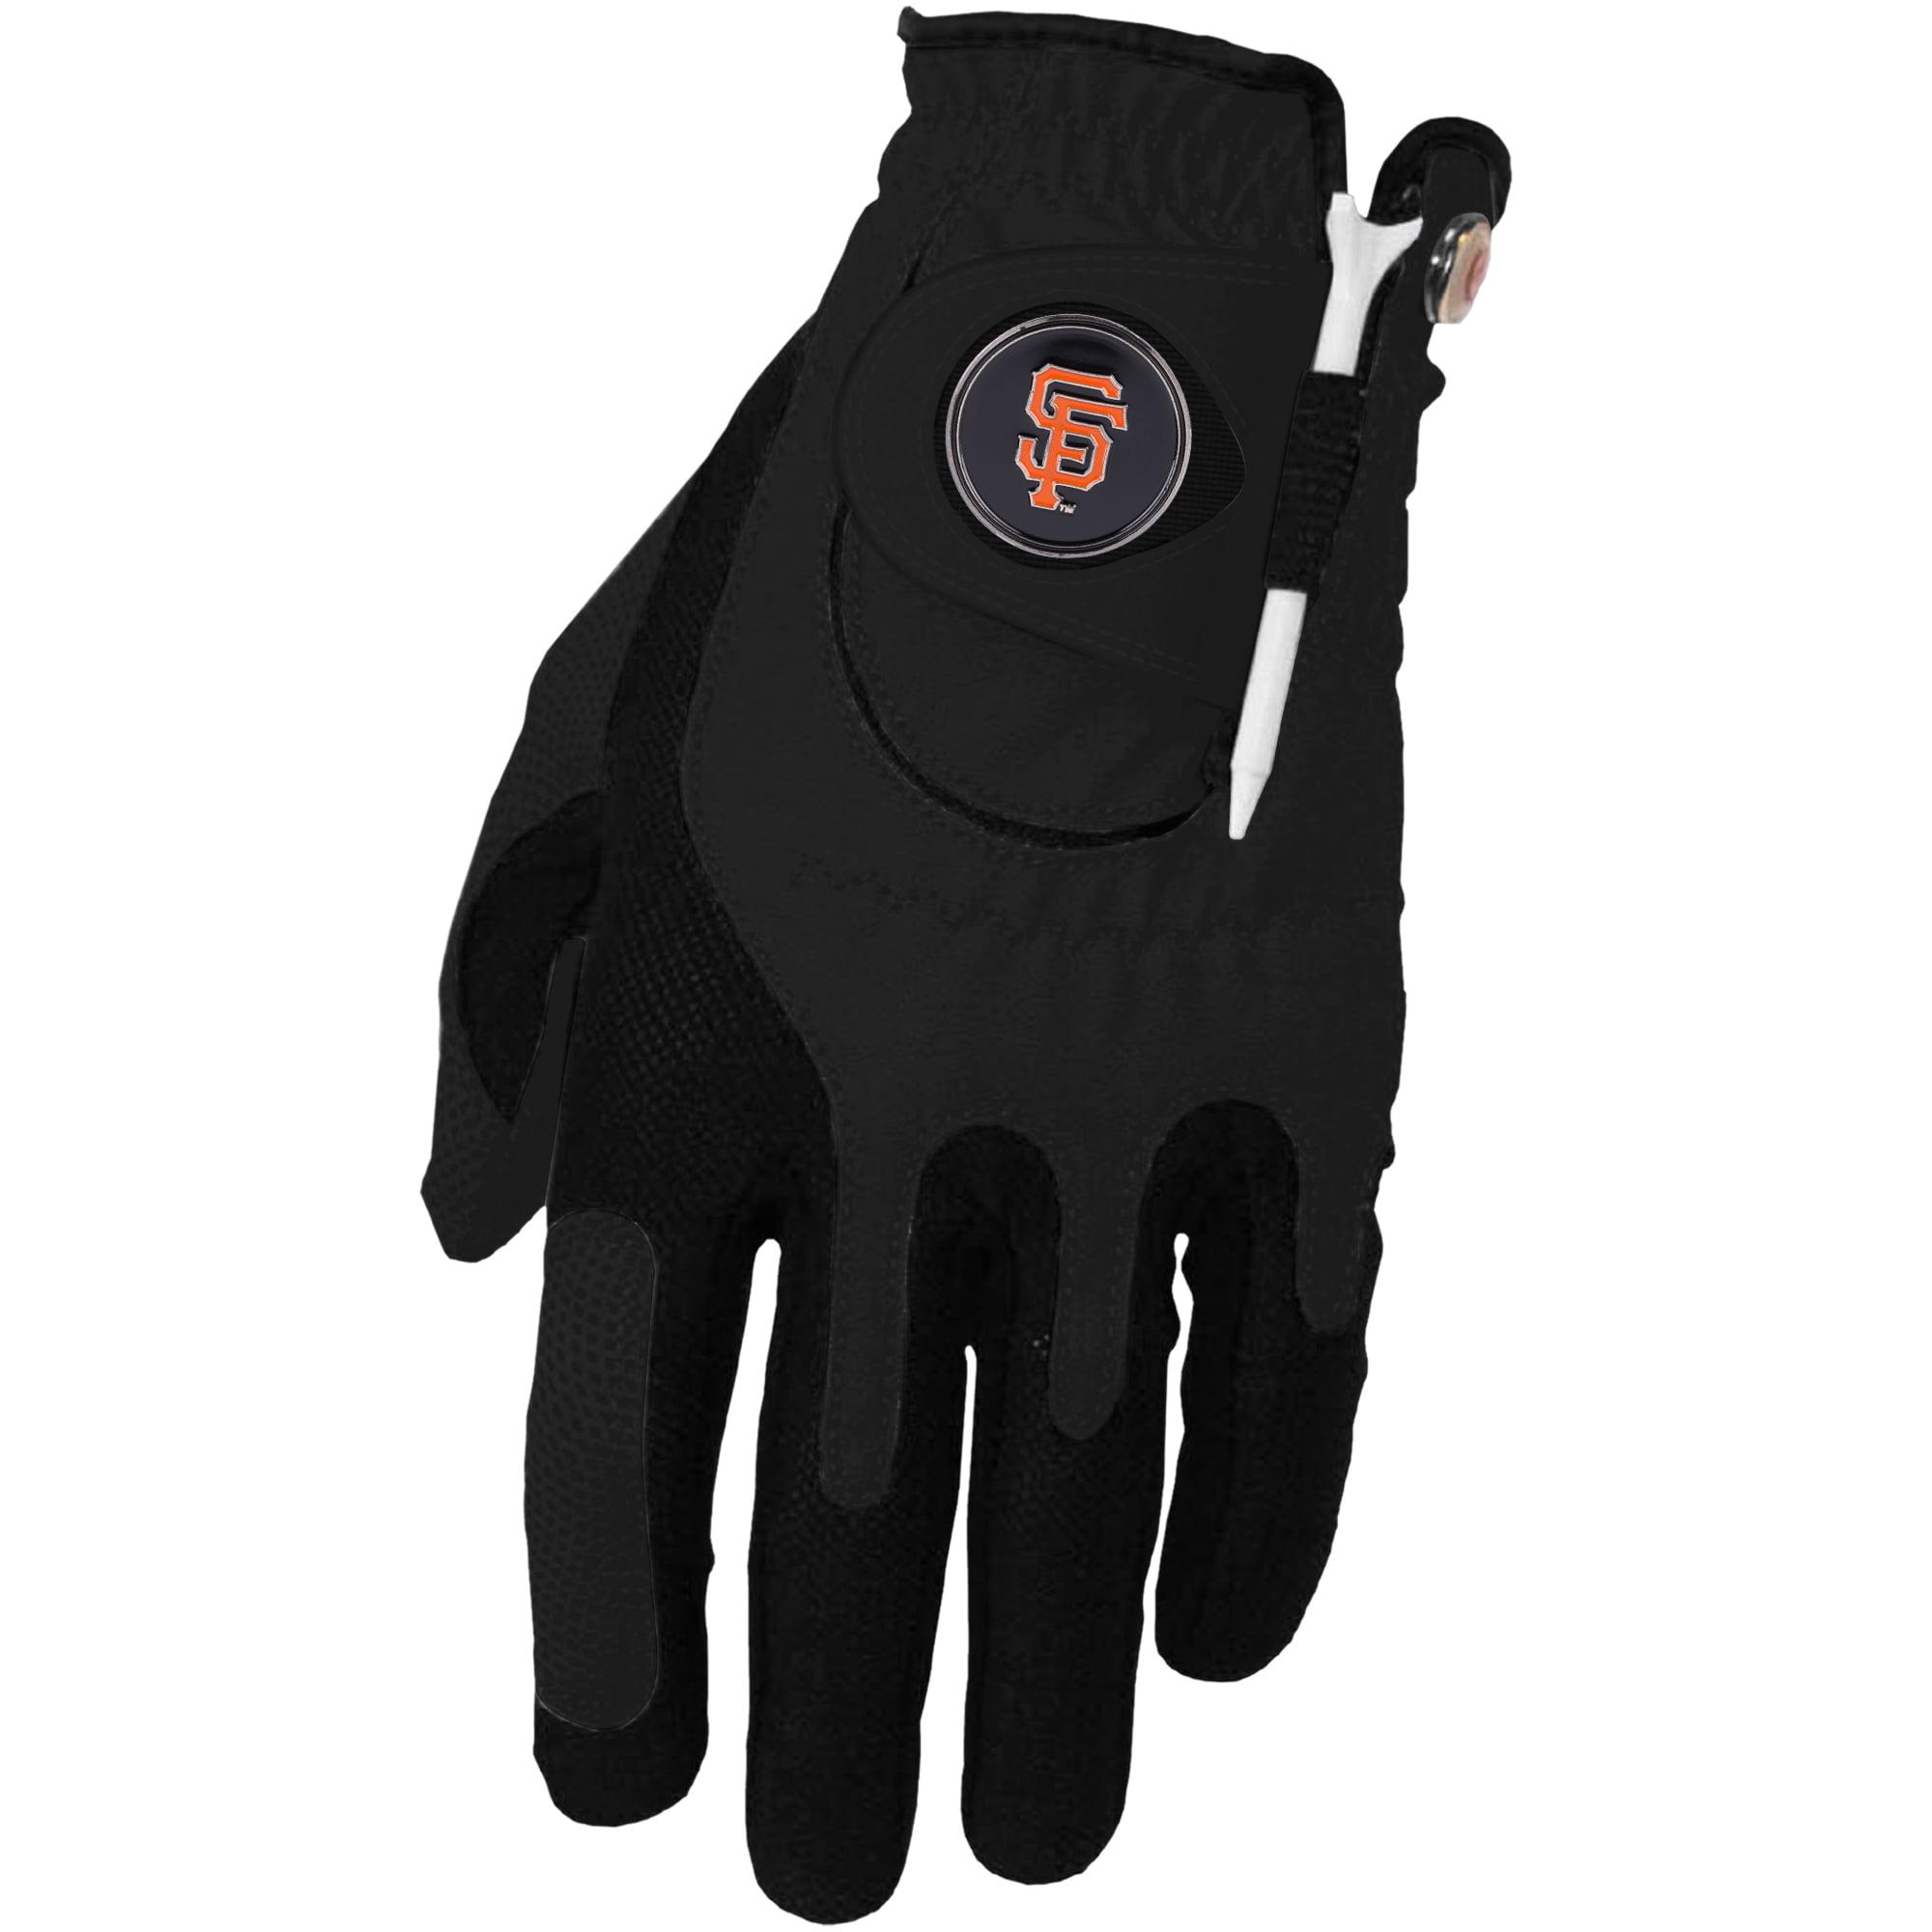 San Francisco Giants Left Hand Golf Glove & Ball Marker Set - Black - OSFM